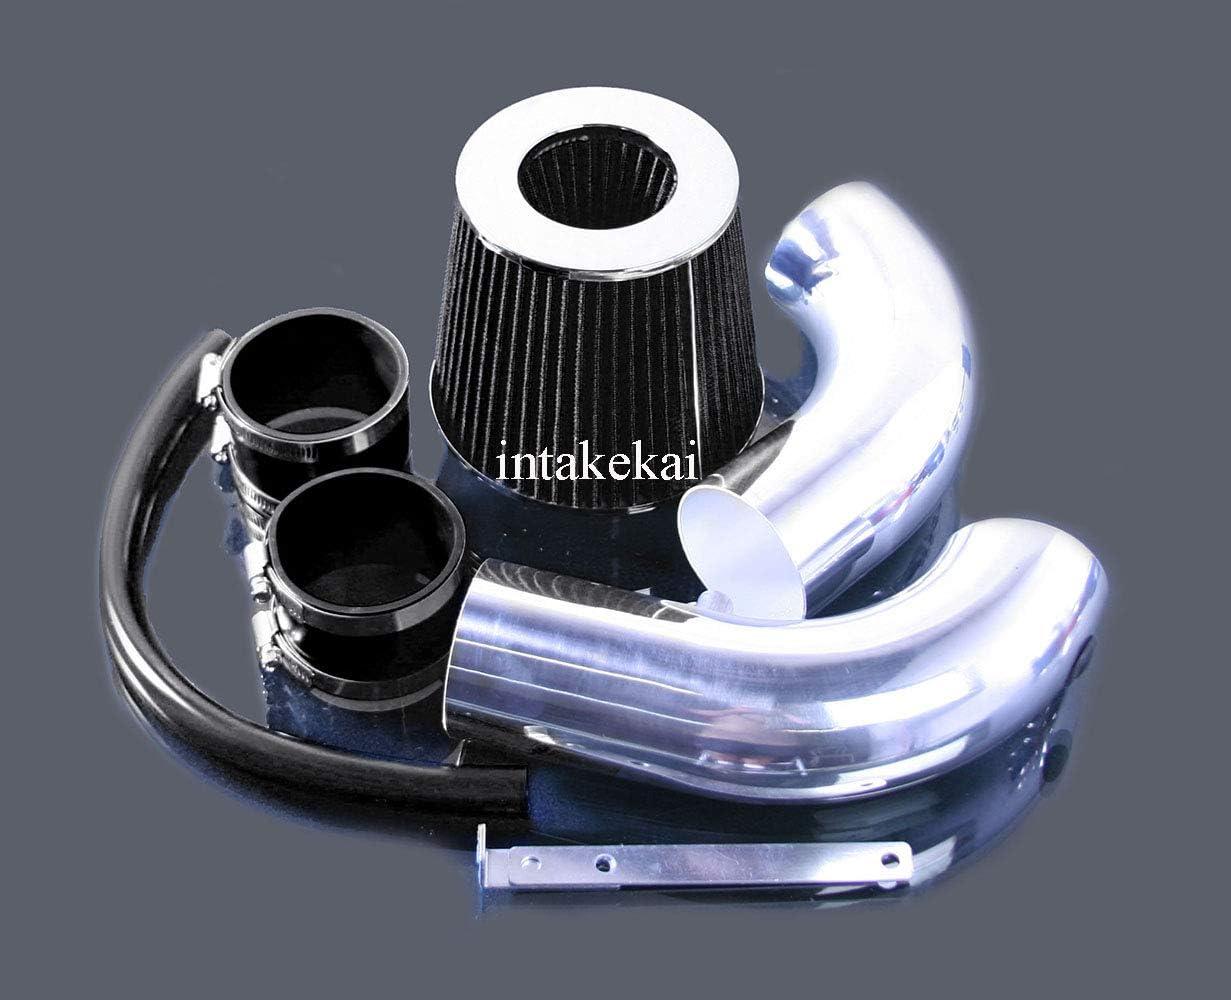 BLACK PERFORMANCE AIR INTAKE KIT FIT 2007-2010 DODGE NITRO 3.7L V6 ENGINE